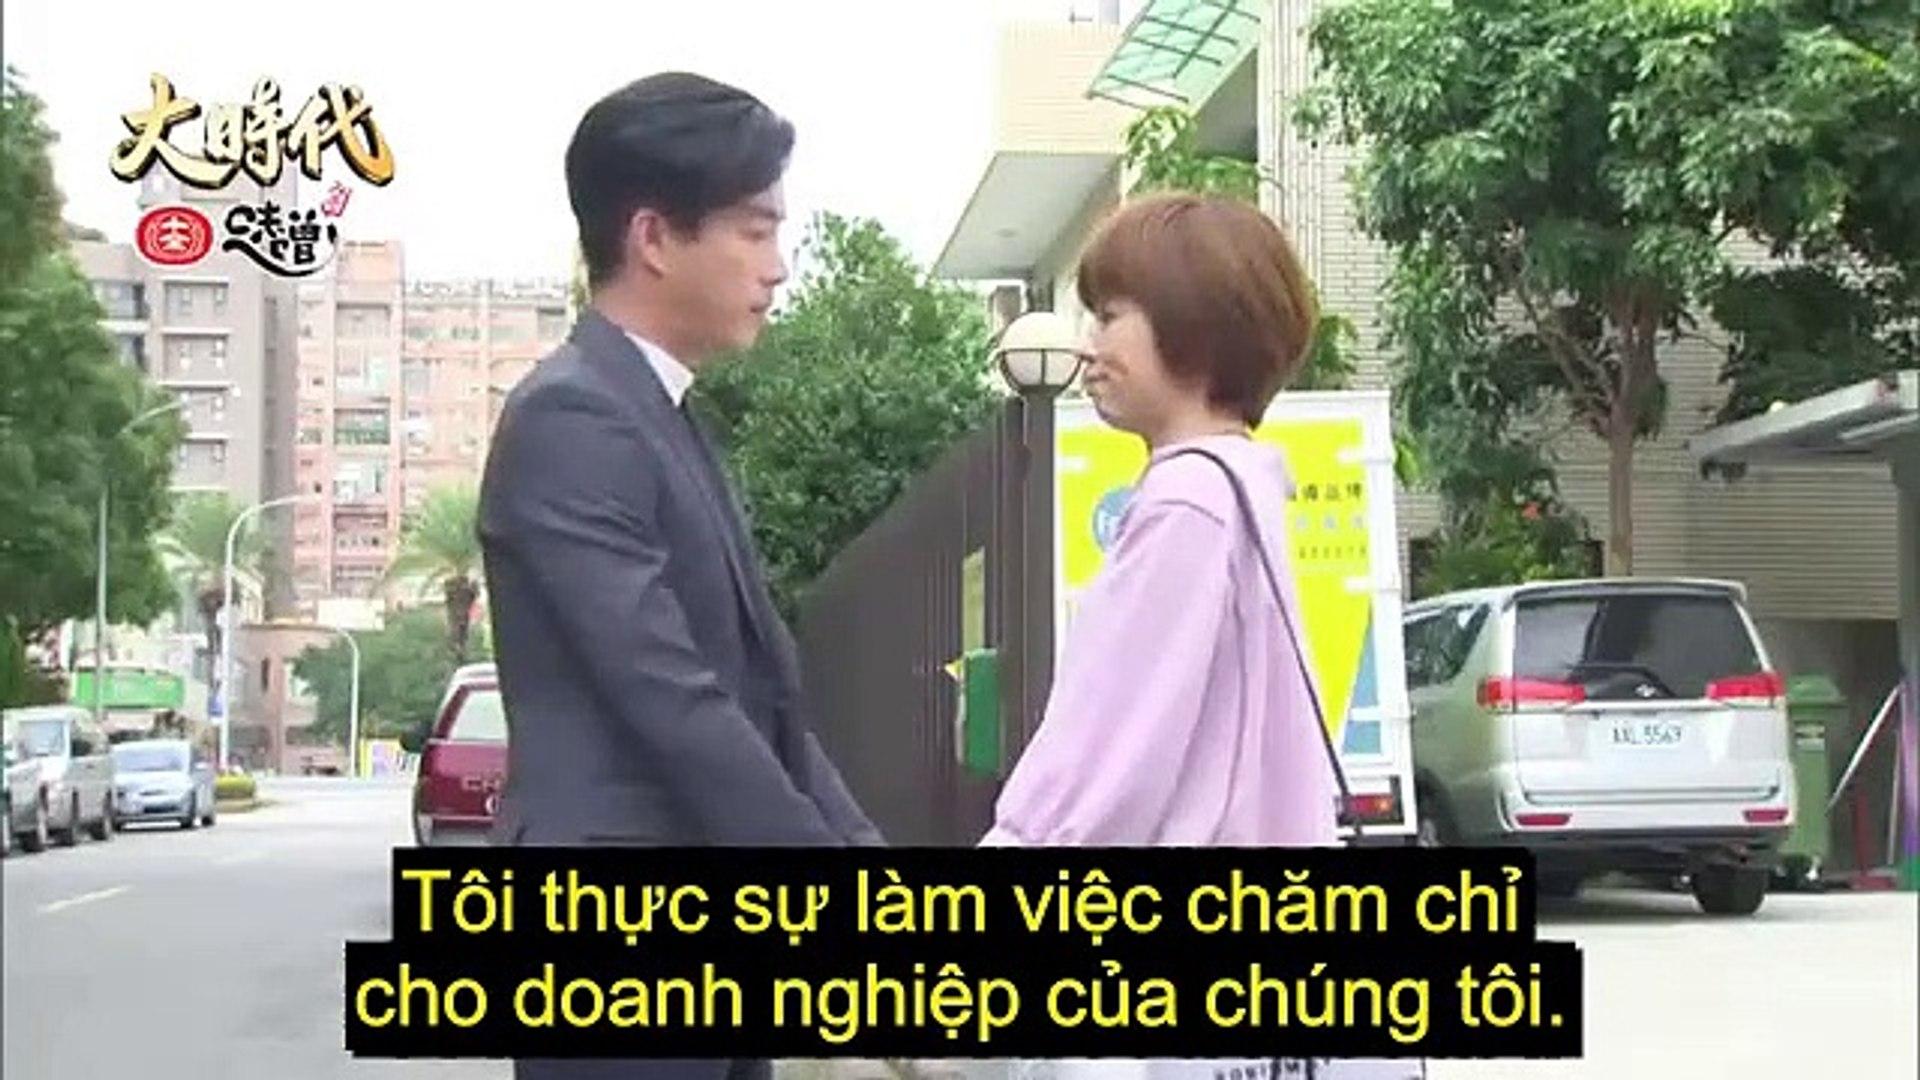 Đại Thời Đại Tập 229 - Phim Đài Loan - THVL1 Lồng Tiếng - Phim Dai Thoi Dai Tap 230 - Phim Dai Thoi